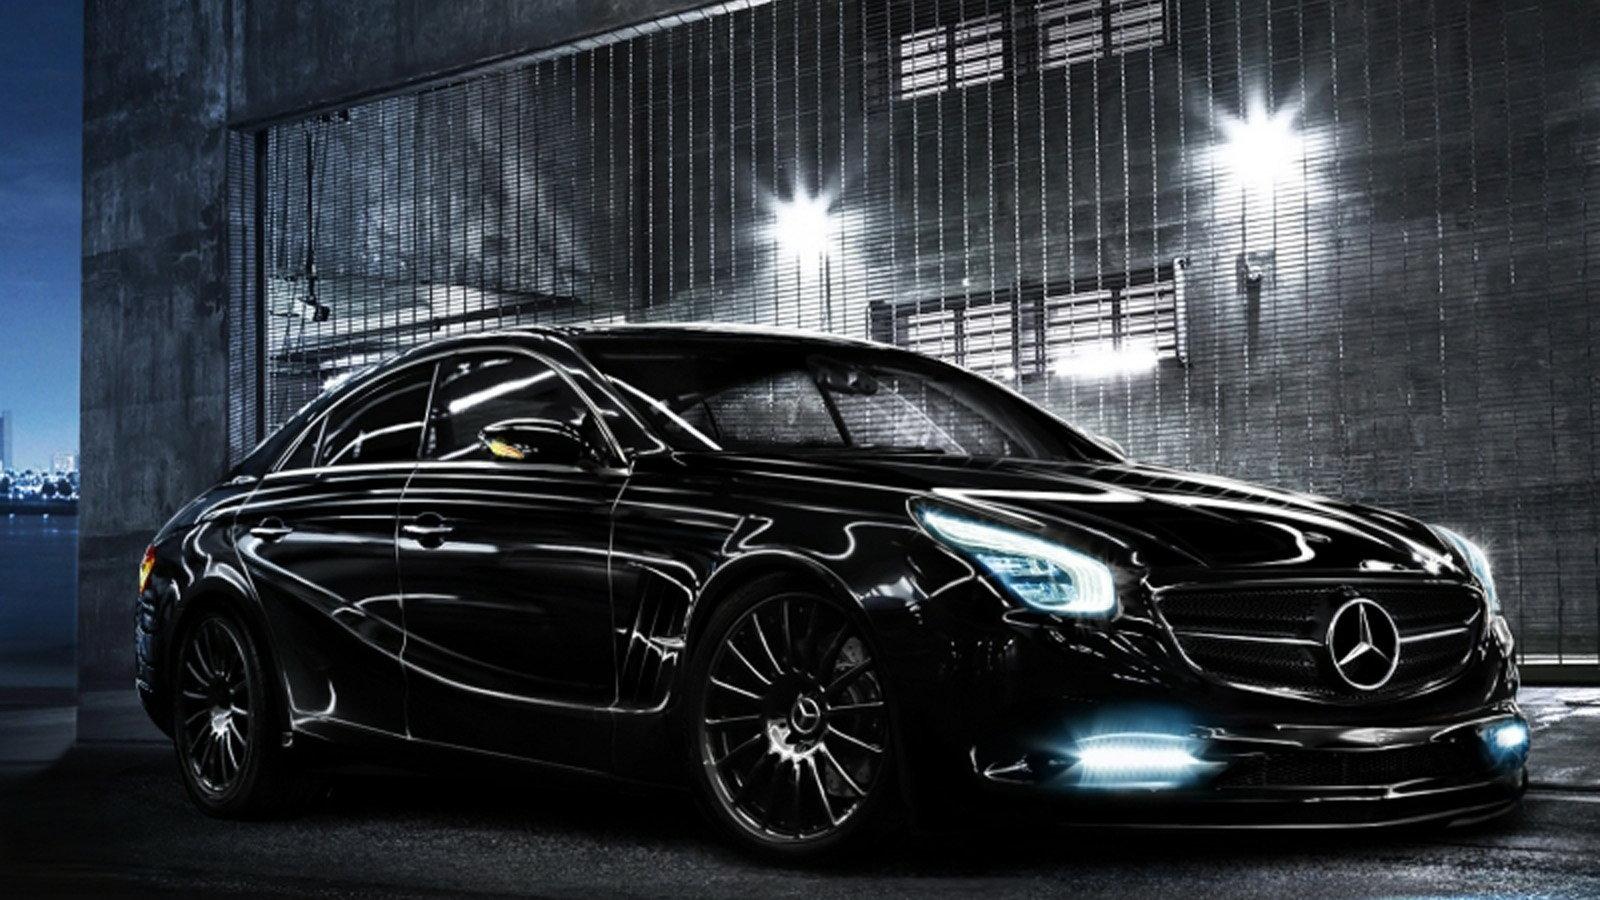 7 Ominous Mercedes Benz Wallpapers Mbworld